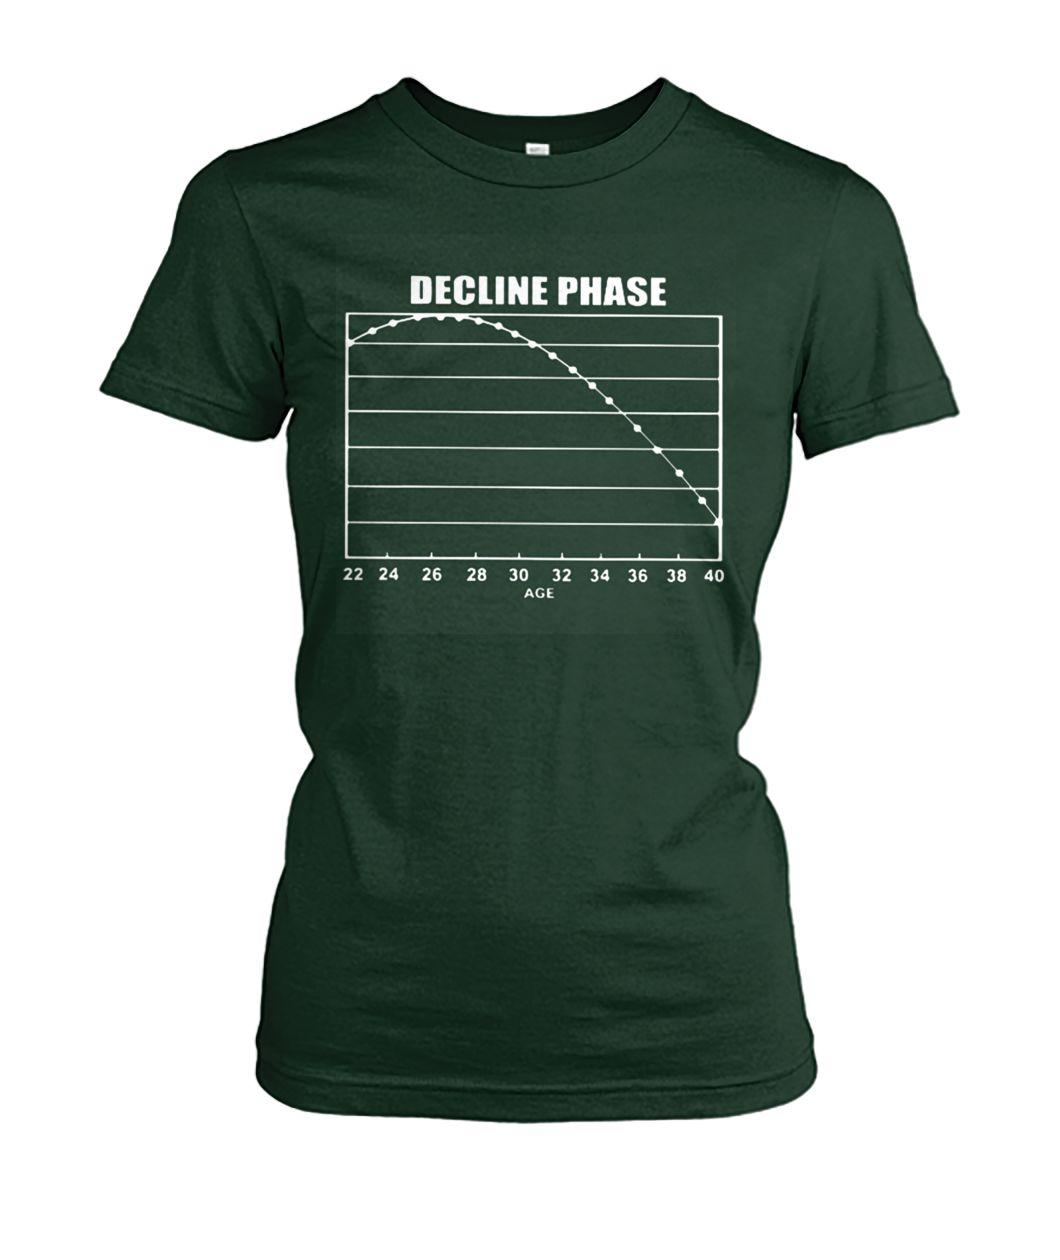 [Hot version] Joey votto decline phase MLB shirt